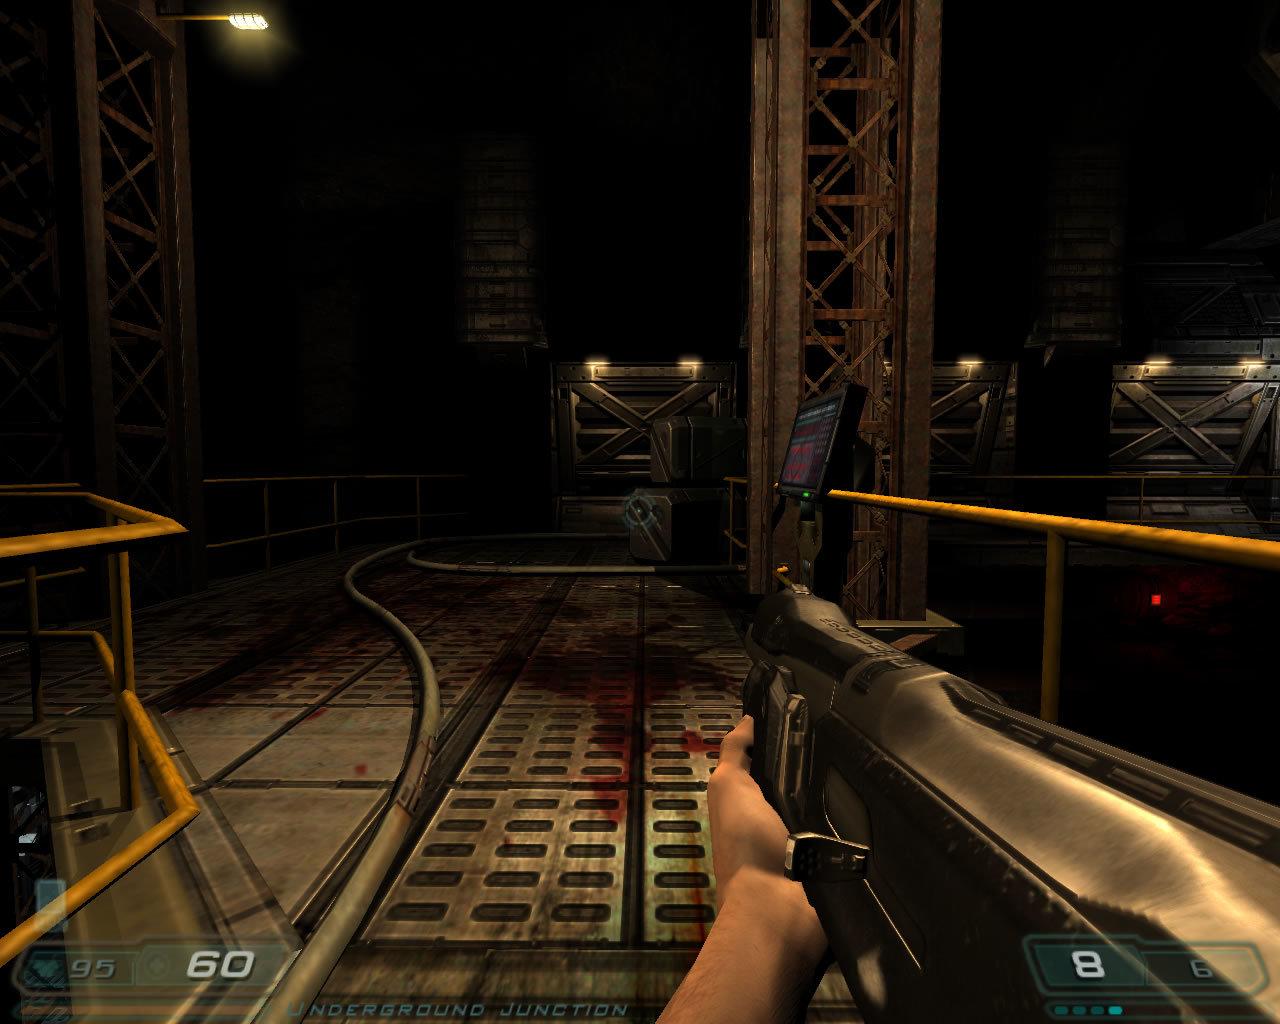 Doom 3 Ultra Quality X800 XT w/ 8xAA